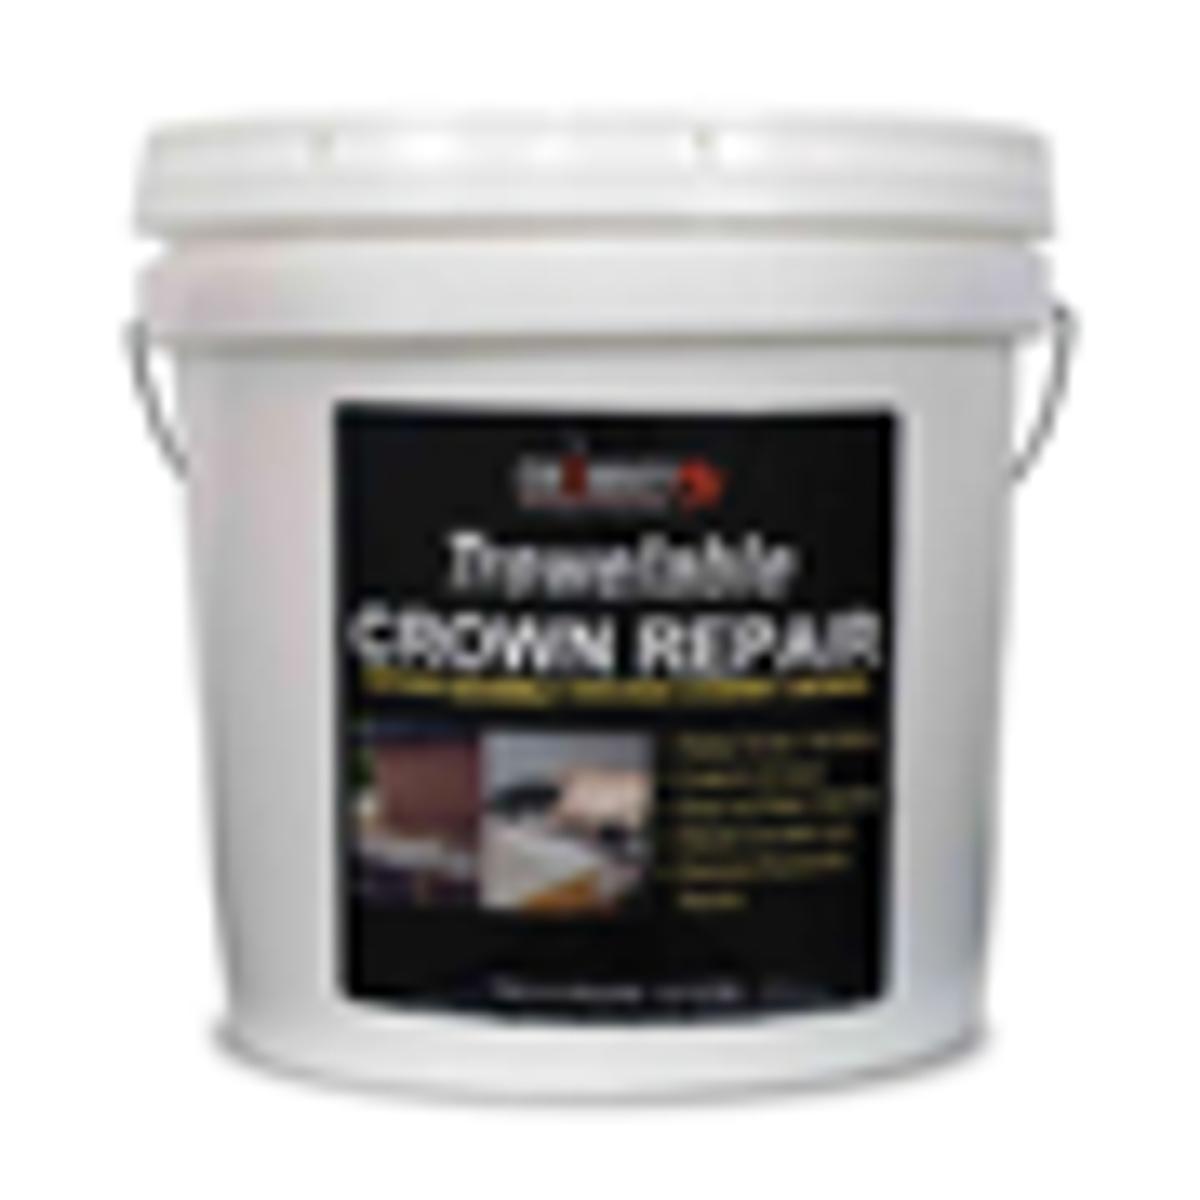 Chimney Maintenance Products